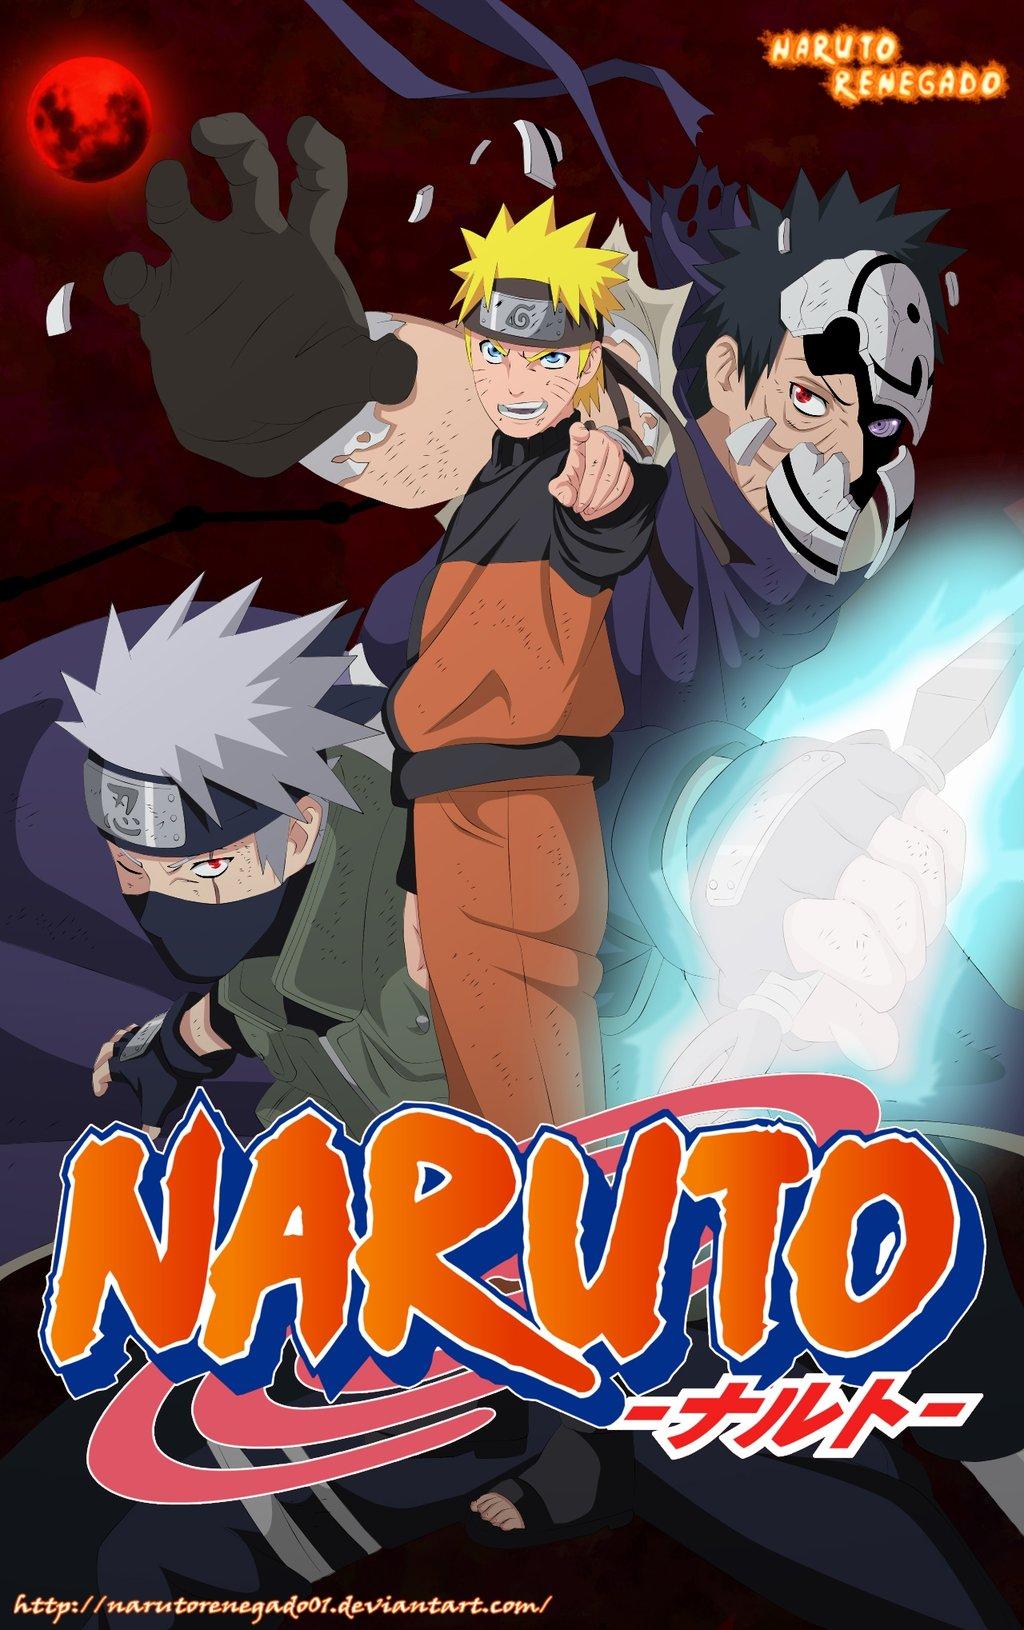 Naruto Cover 63 by NarutoRenegado01